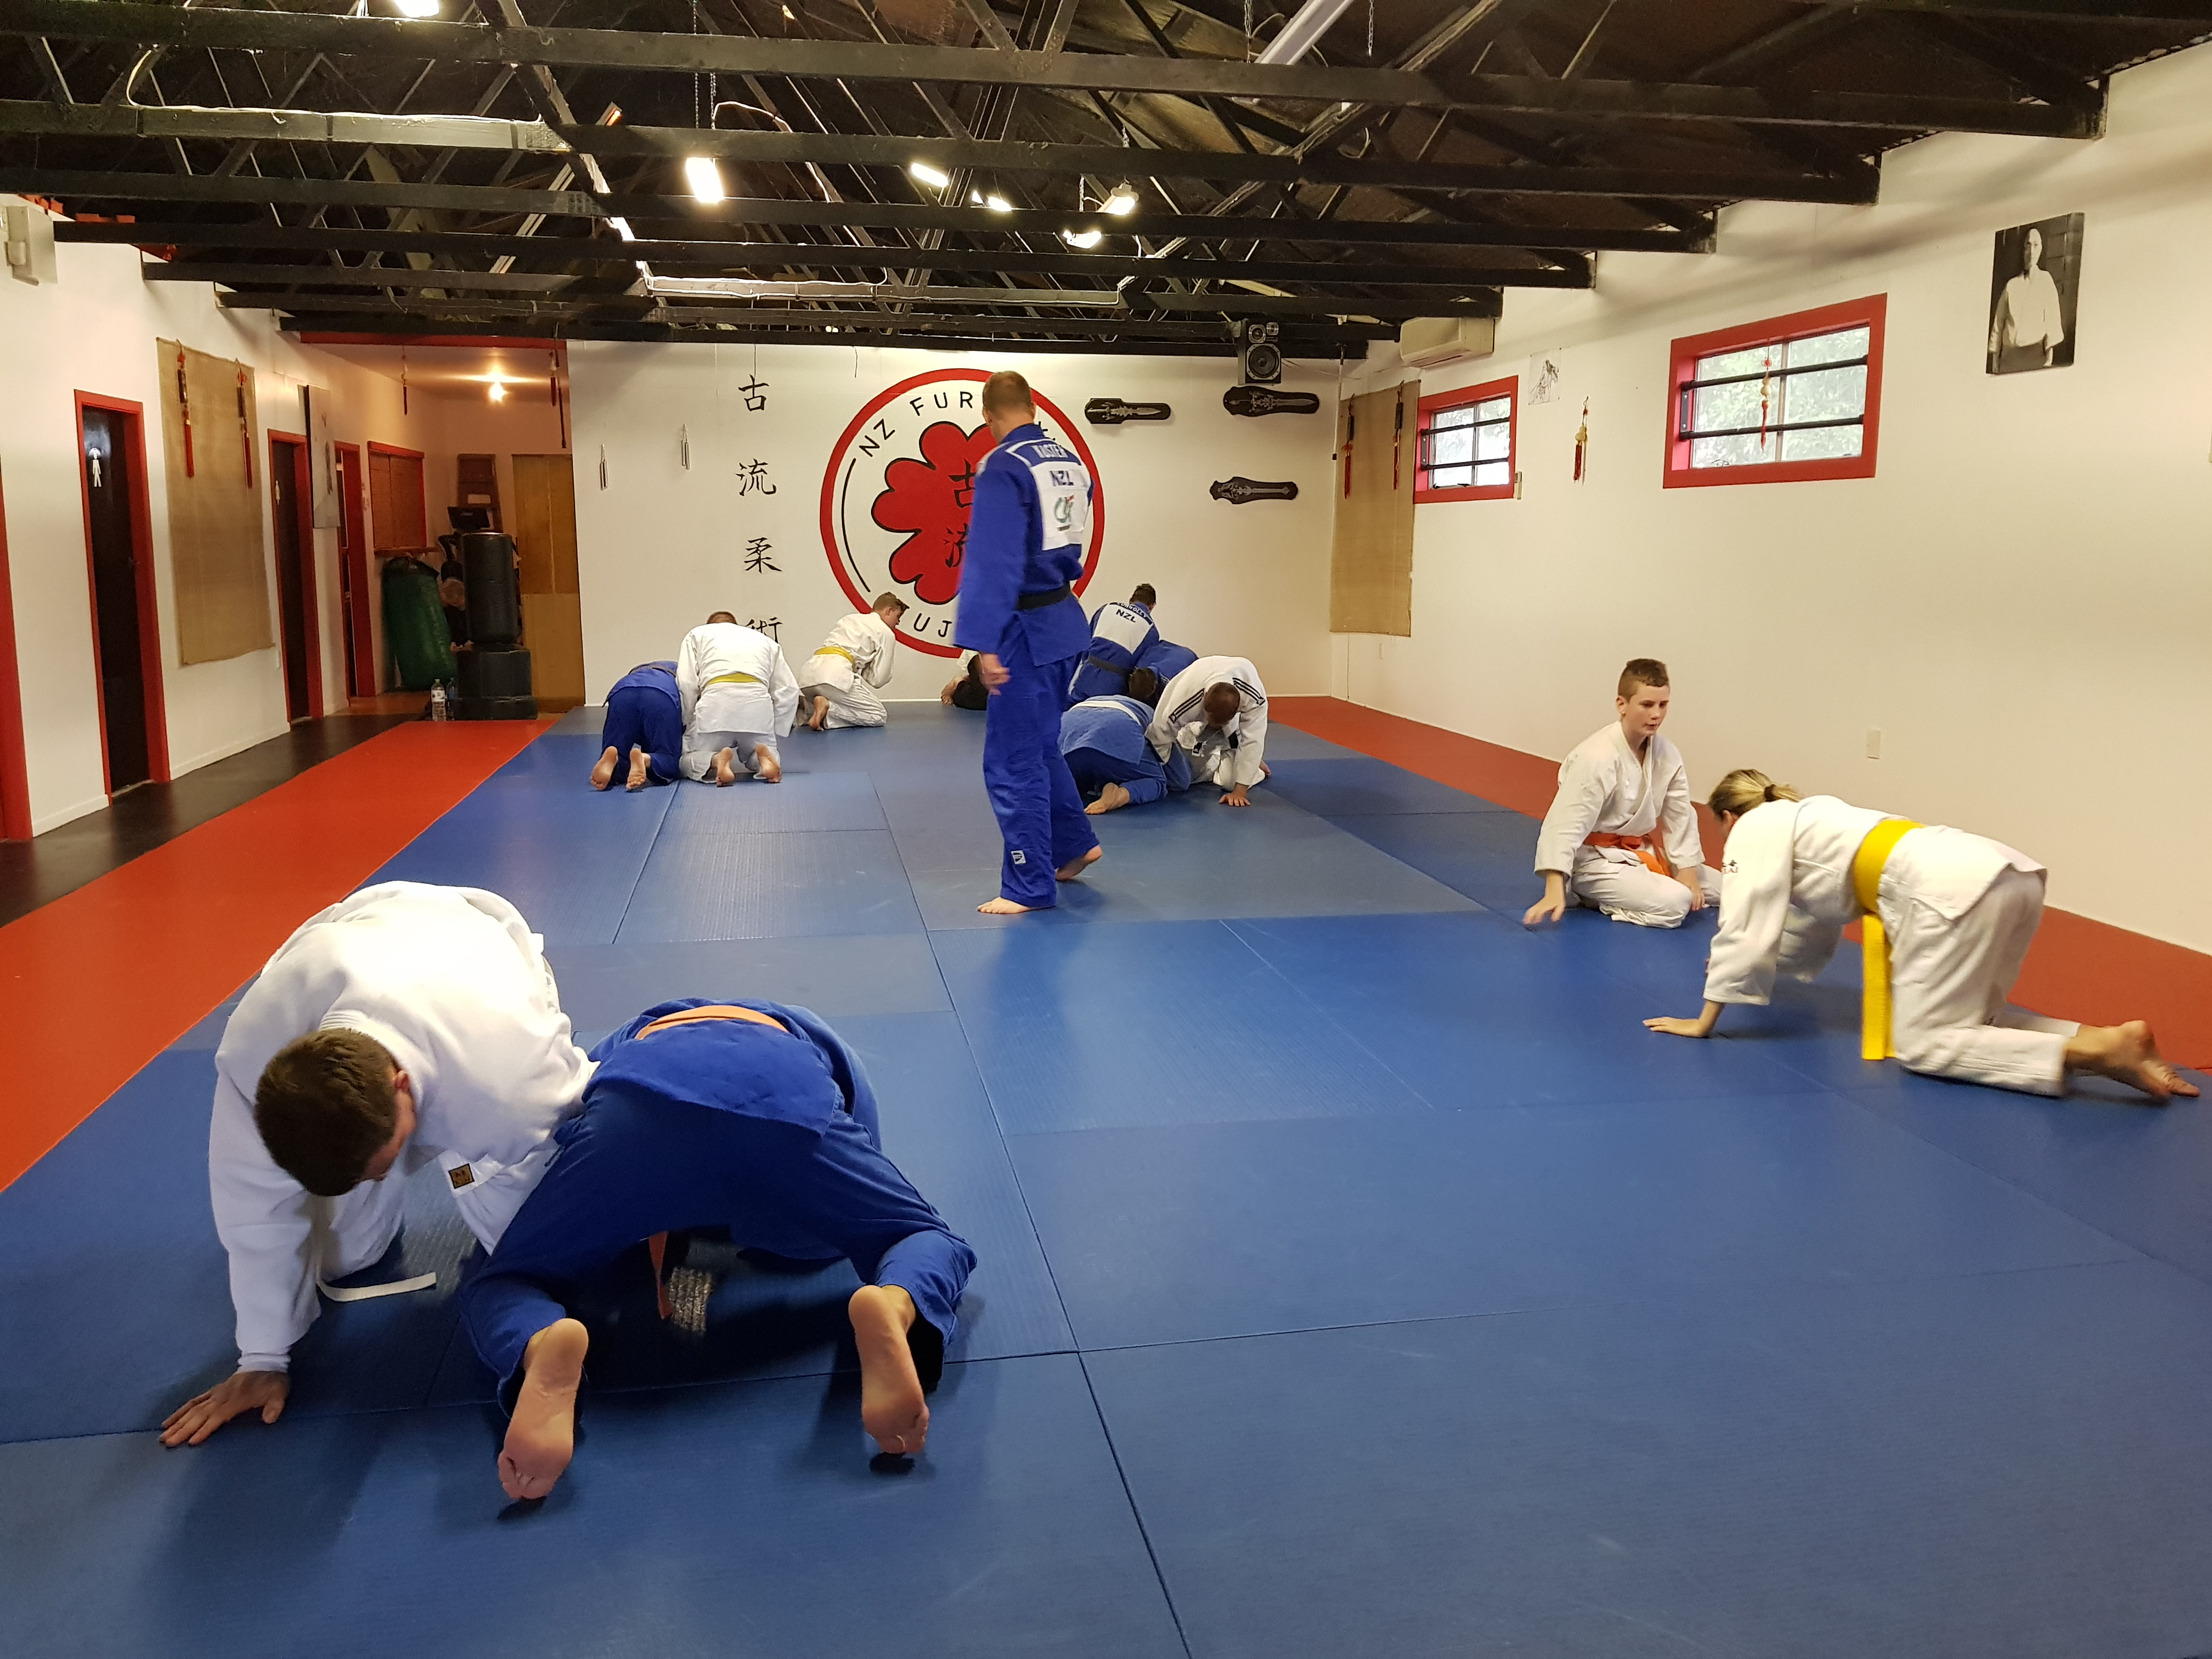 Premiere Equipe Judo Club